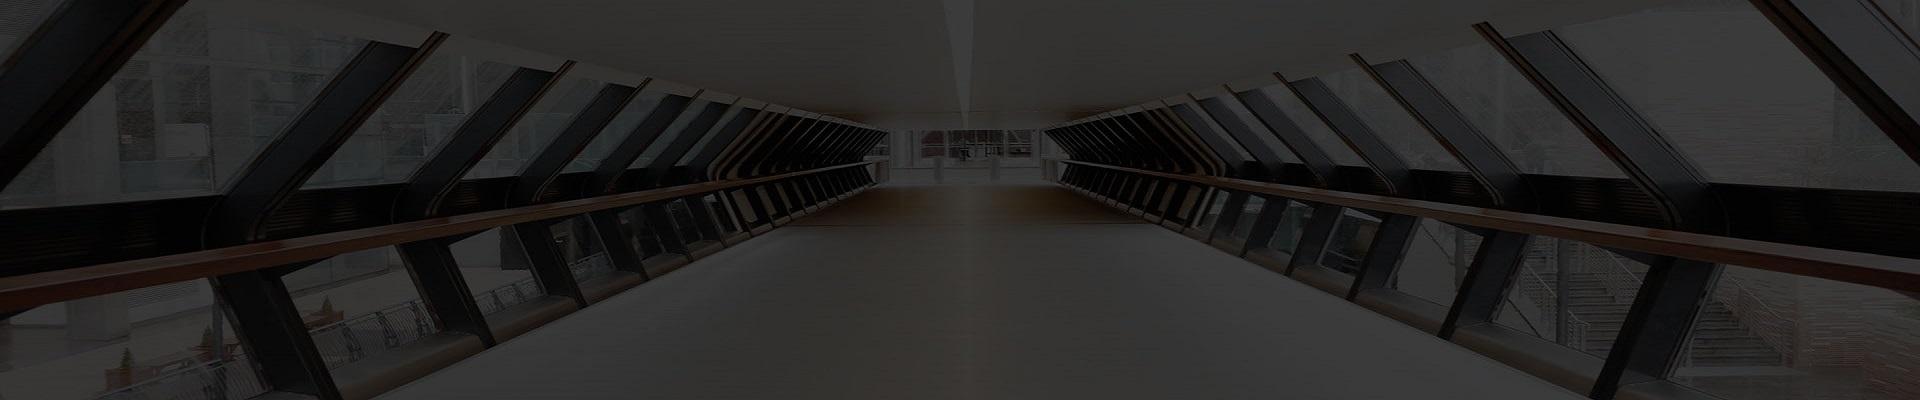 https://urbandirectorate.gos.pk/wp-content/uploads/2020/10/bg1.jpg